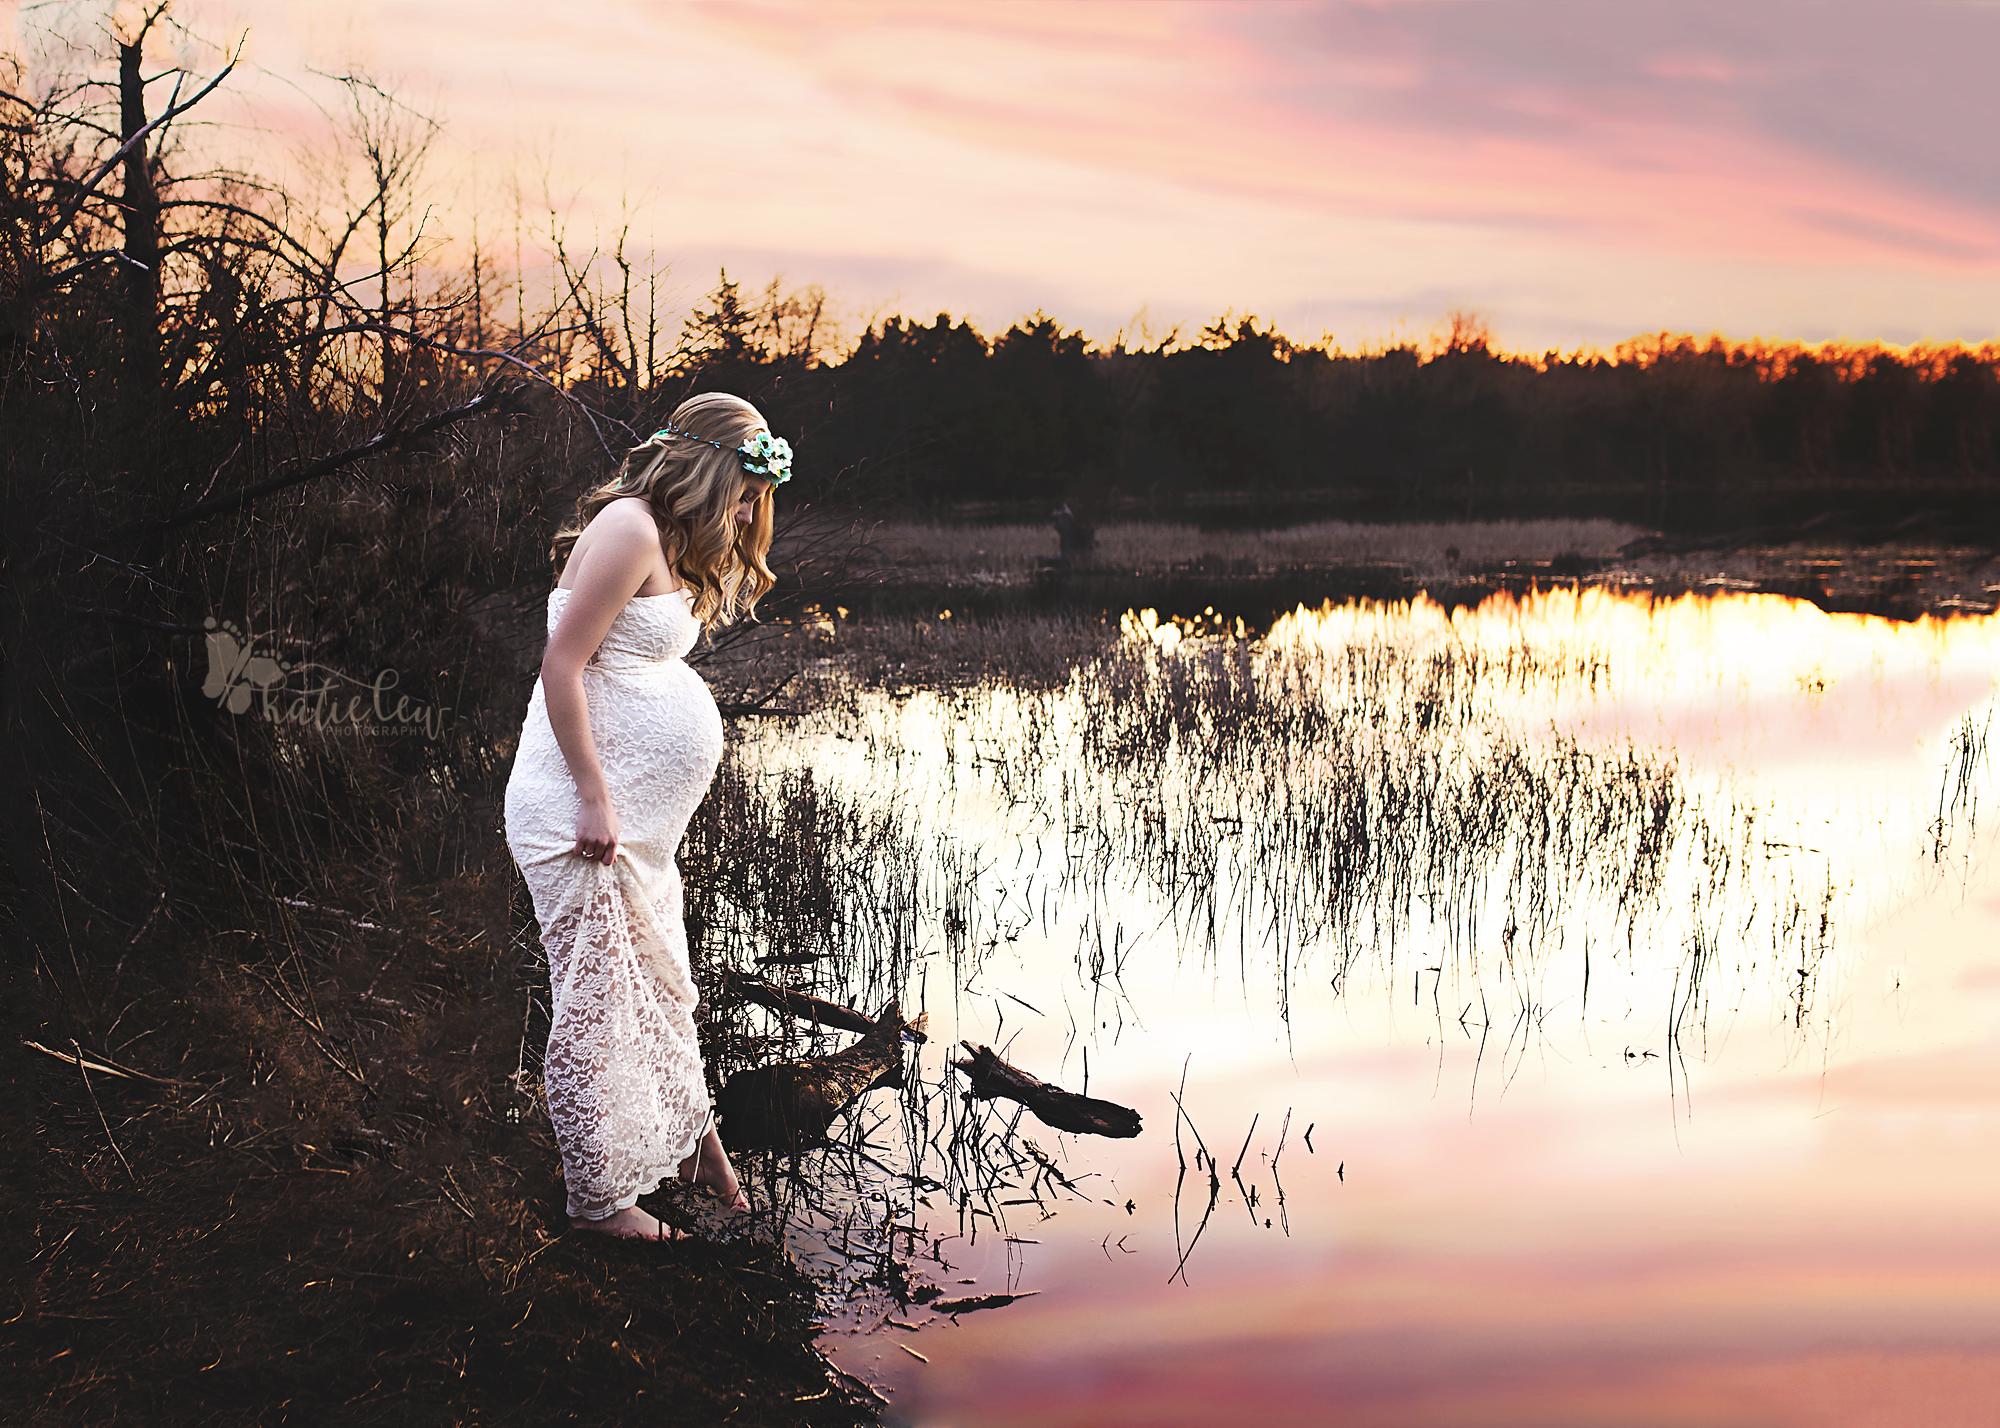 Katielew Photography Maternity Photos Stillwater Oklahoma